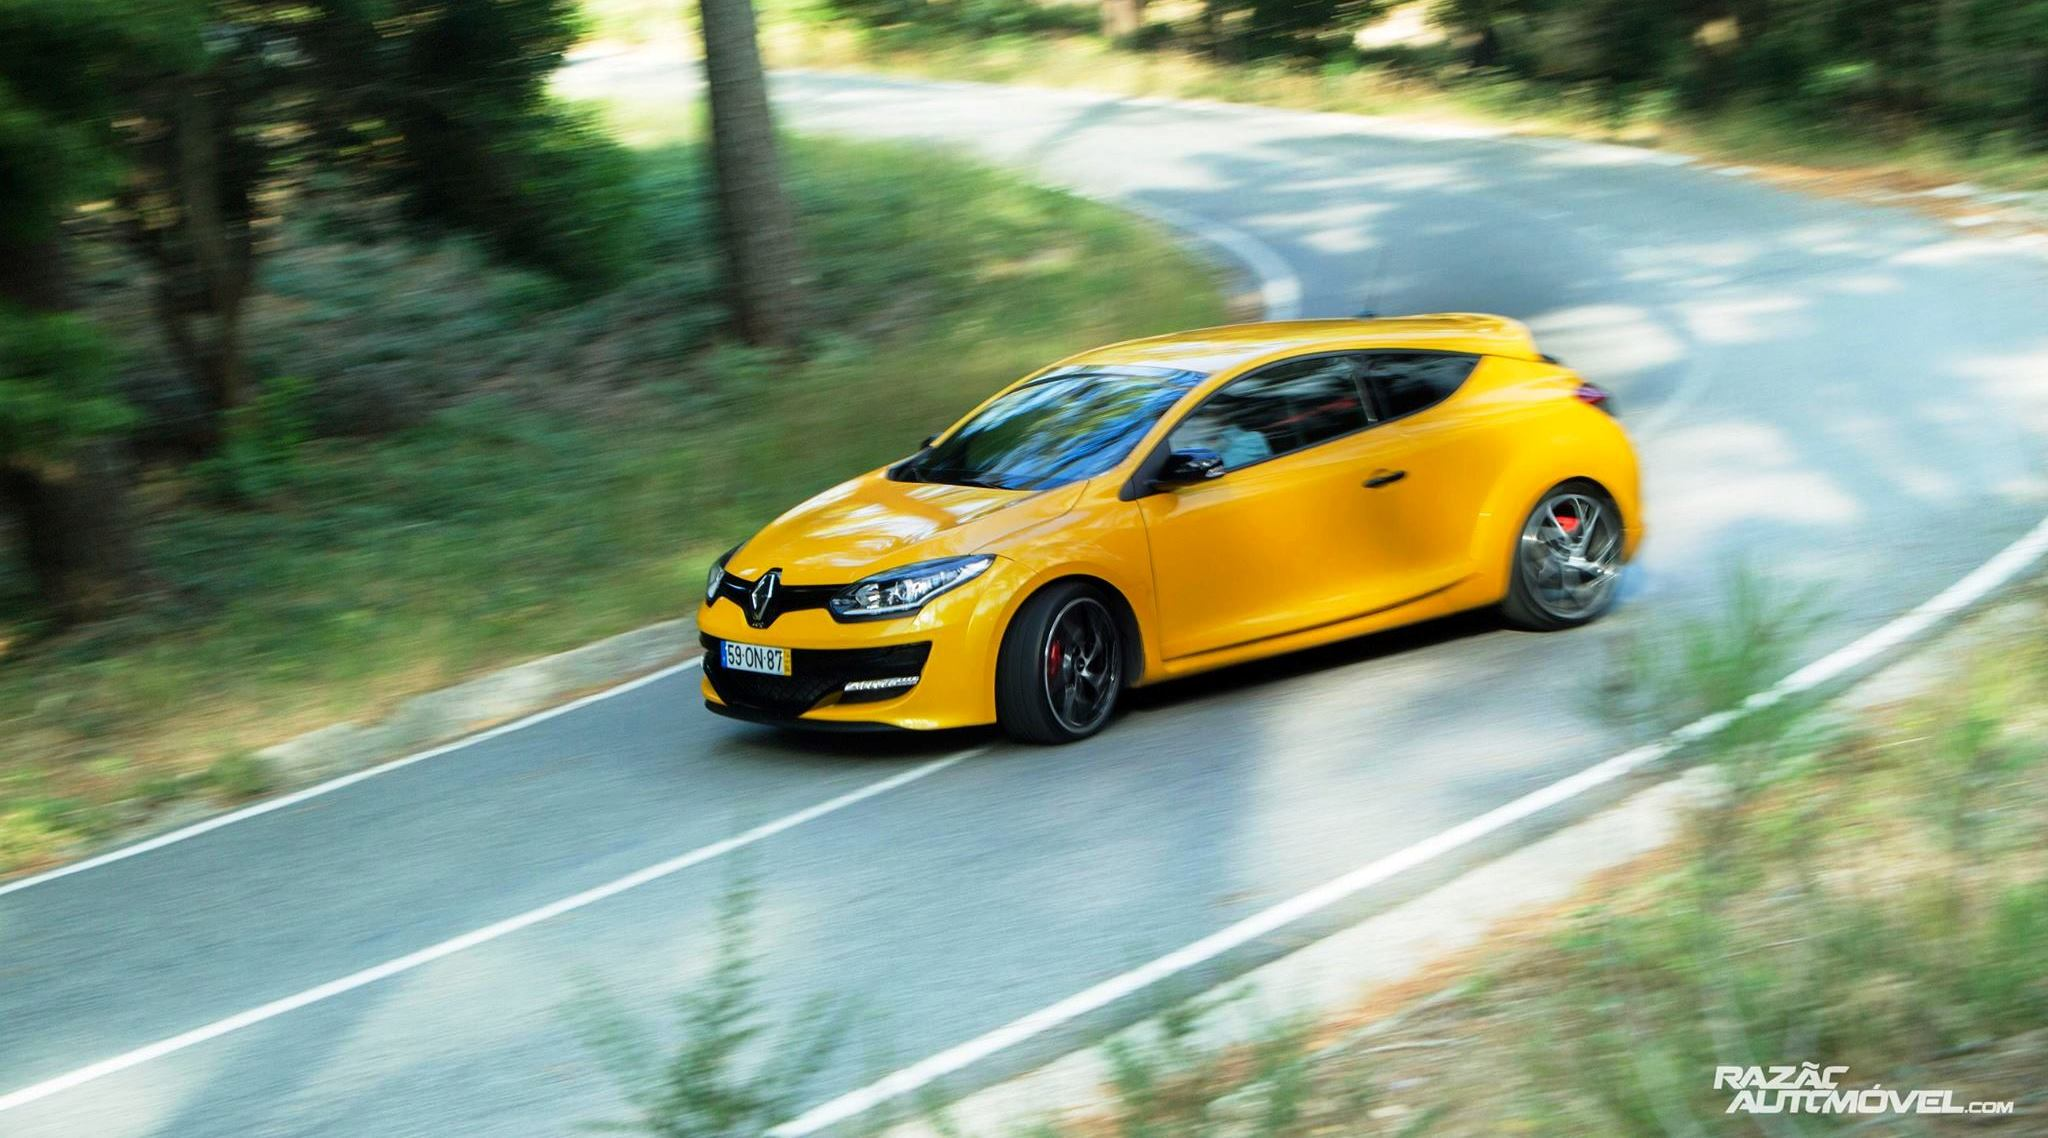 2014 Renault Megane RS